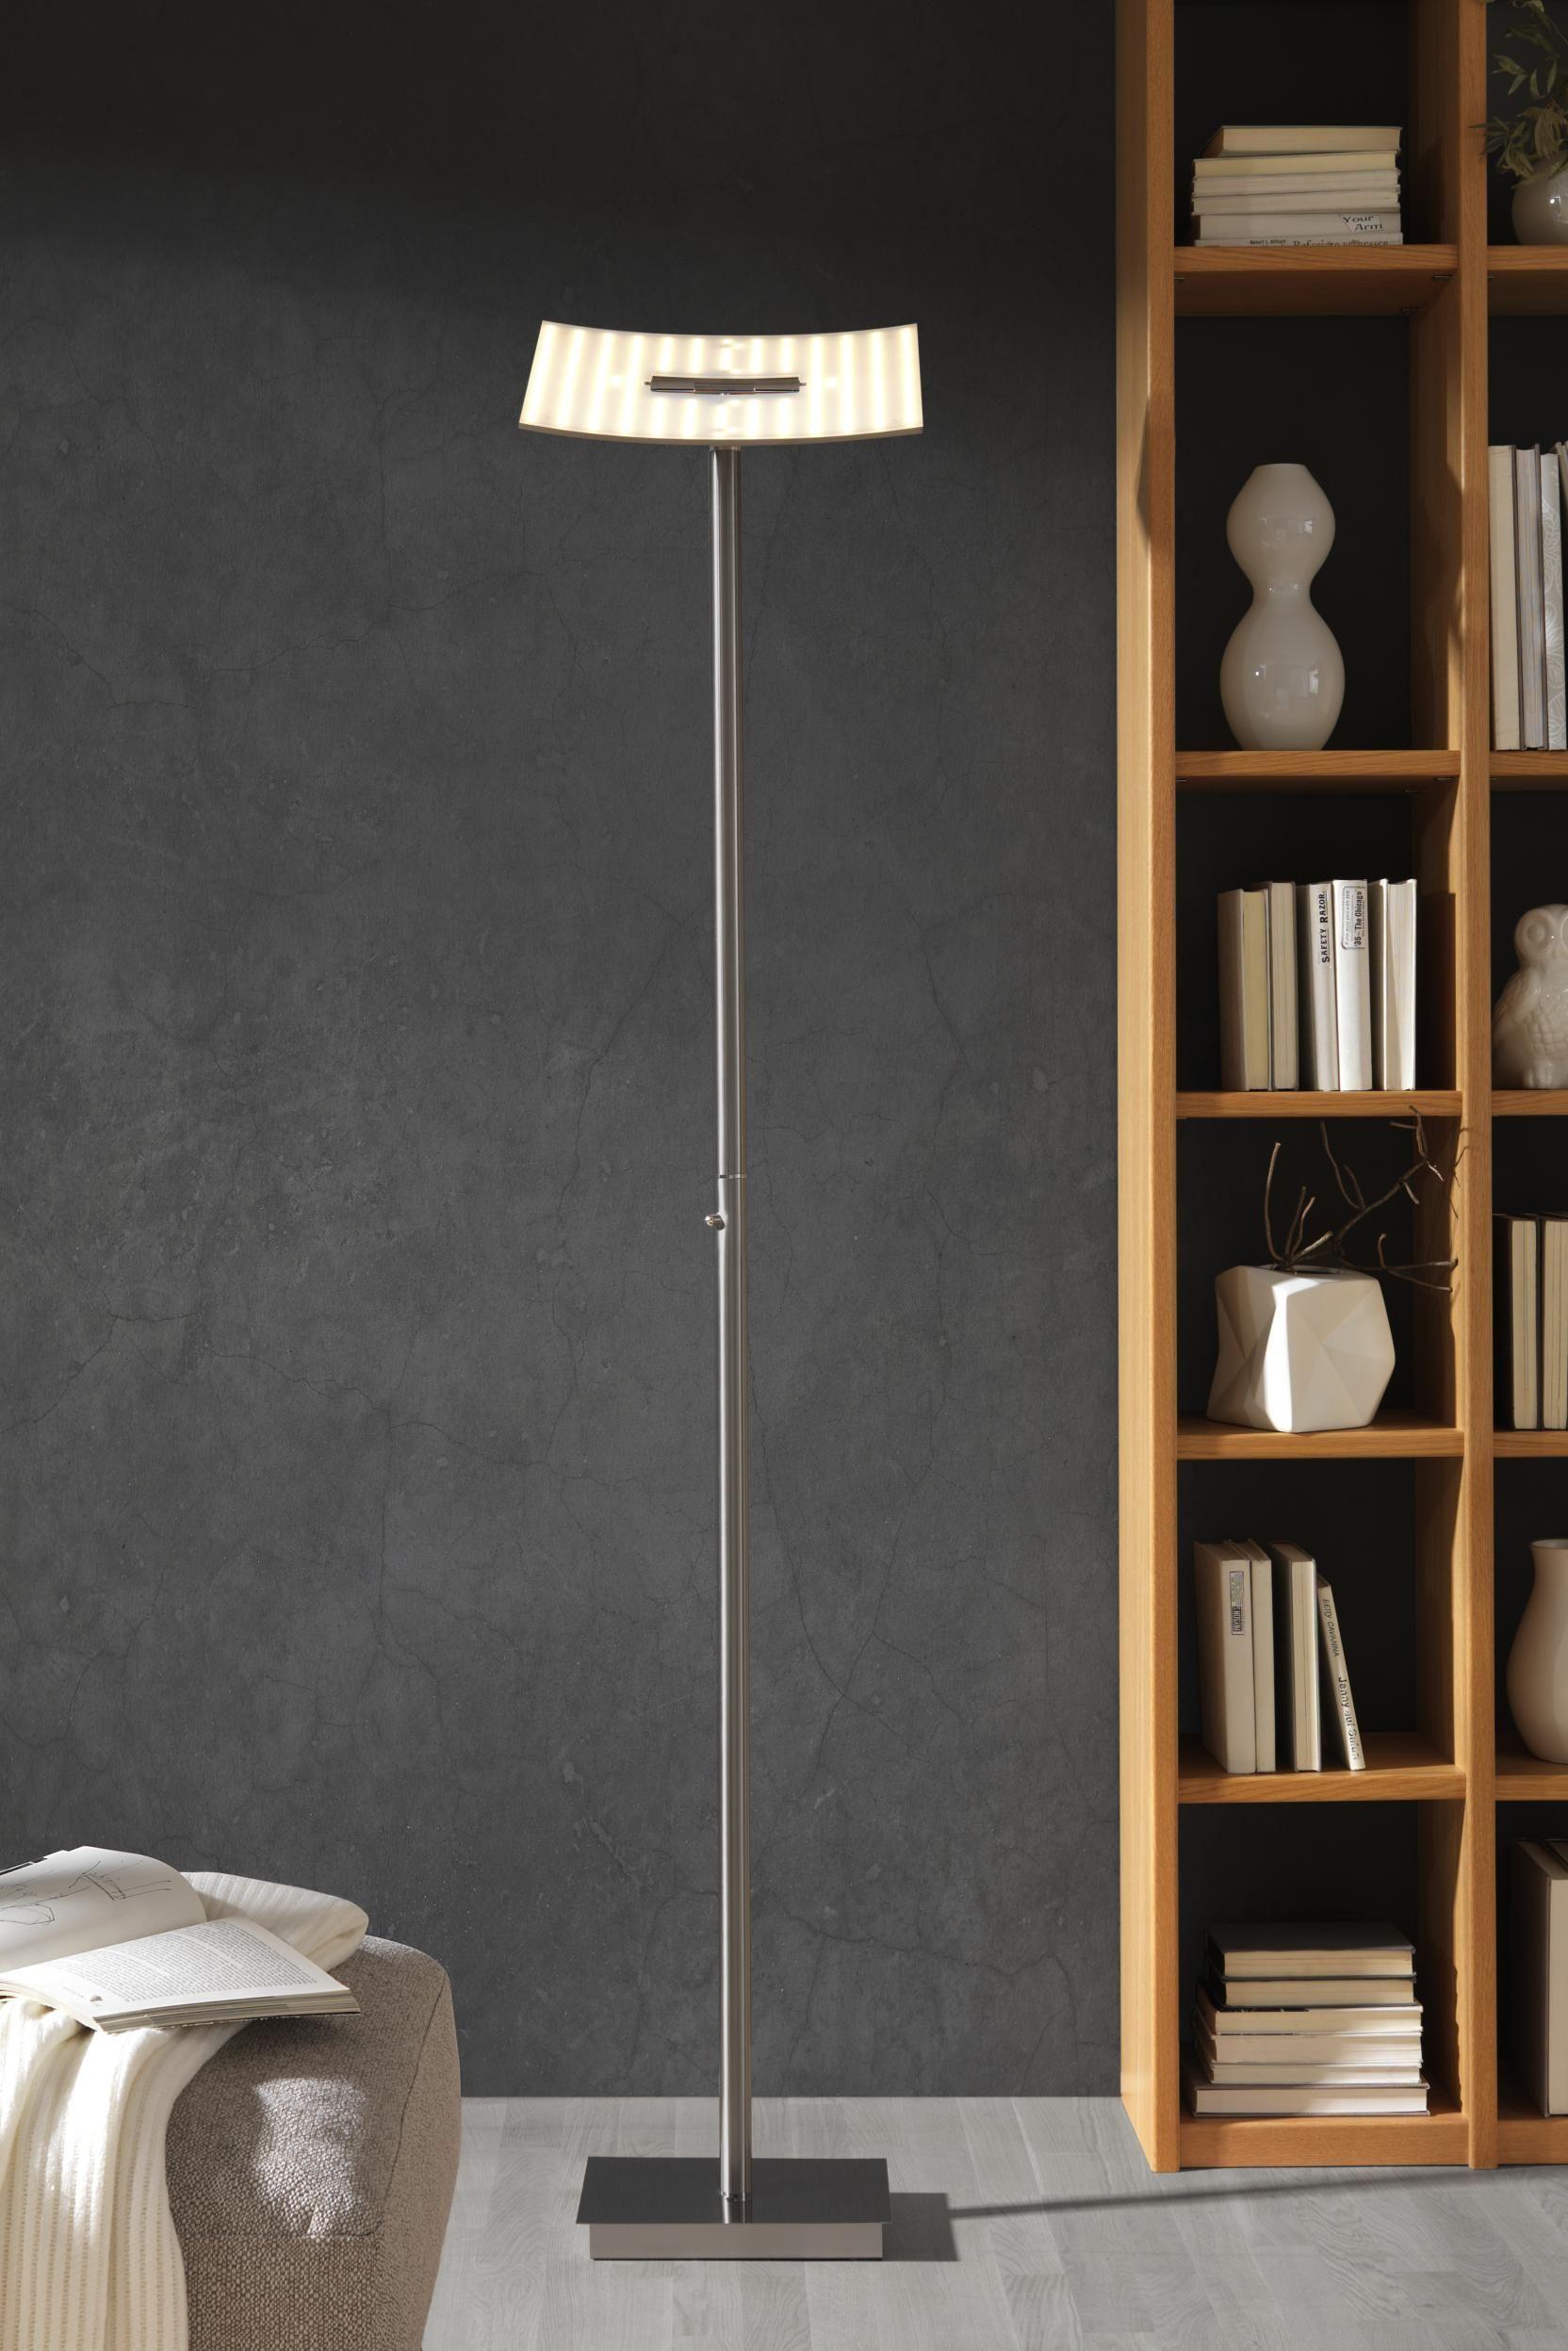 Led Stehlampe Lampenwelt Pinterest